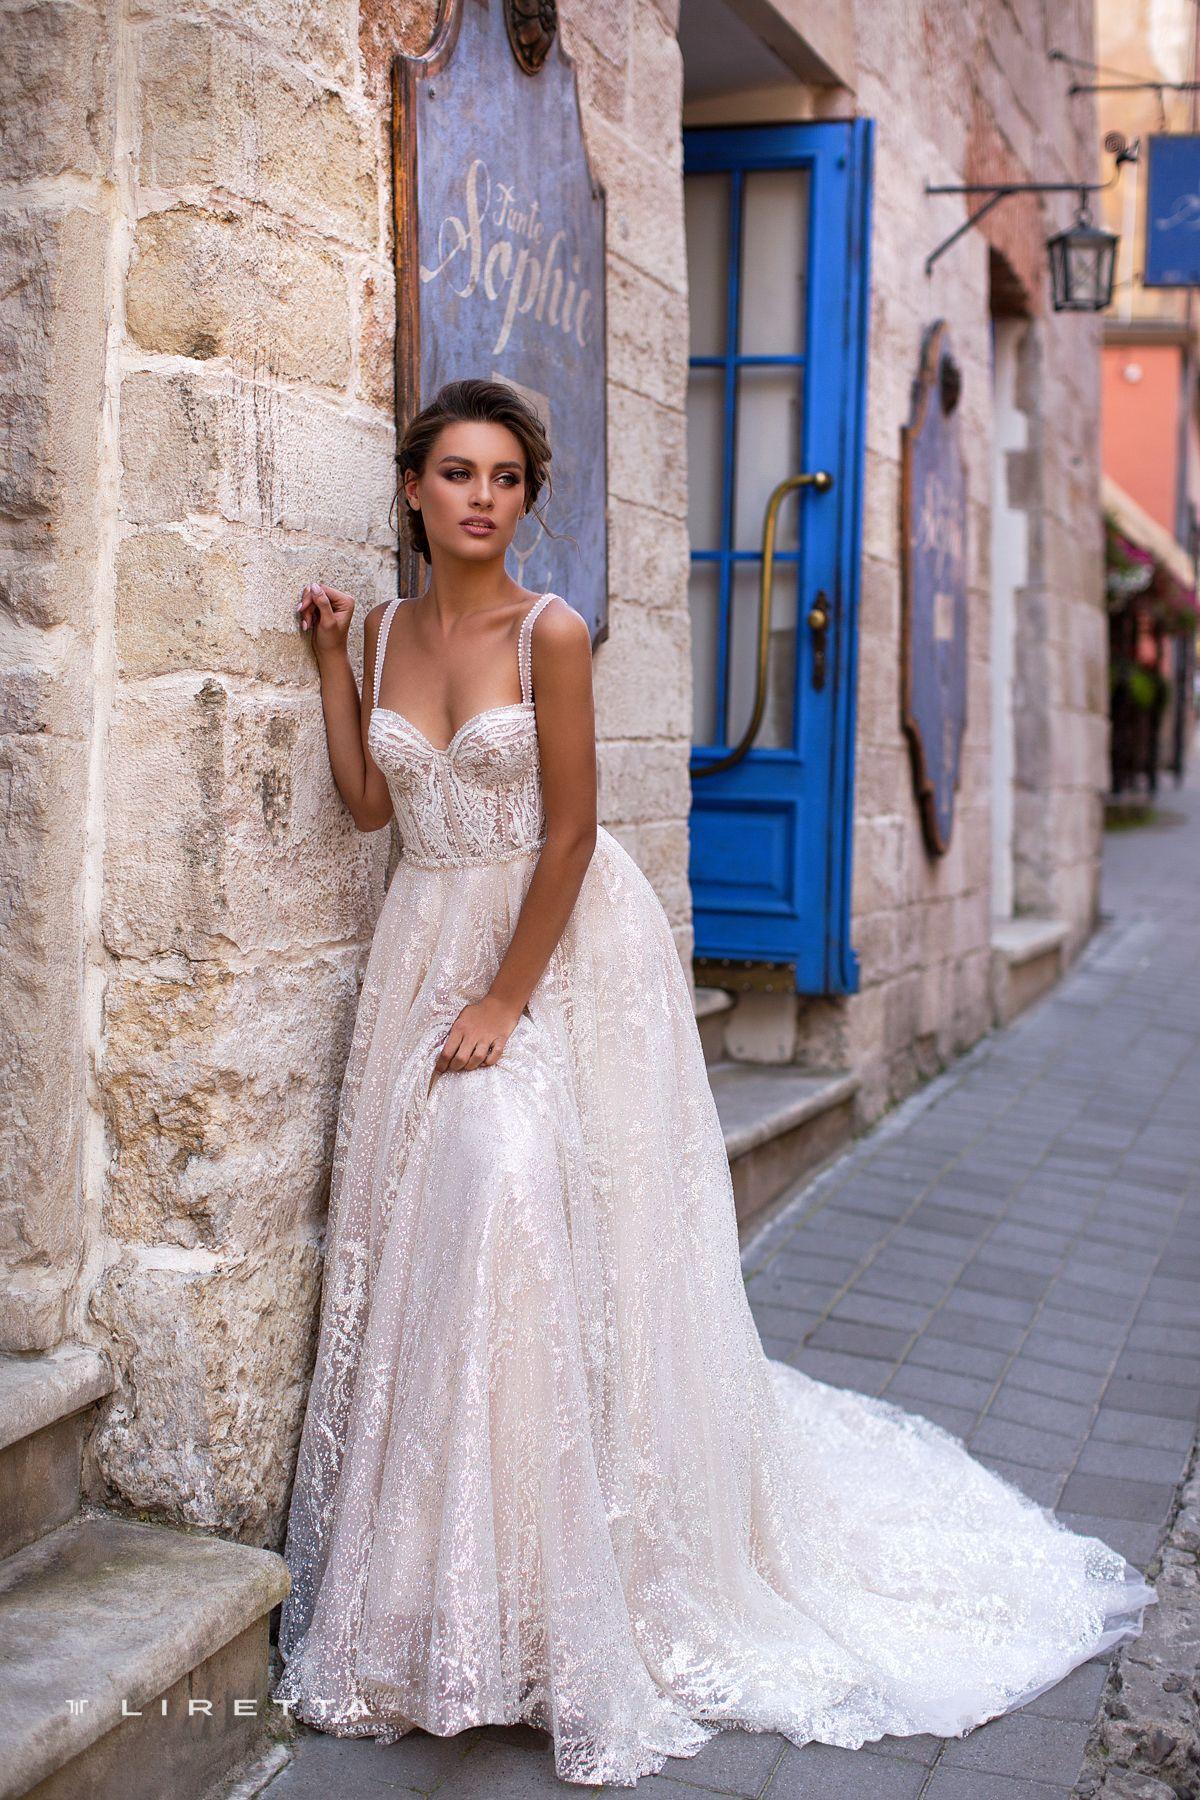 744ae2afb8c Liretta Wedding Dress - Maragaturra White dress Свадебное платье ...